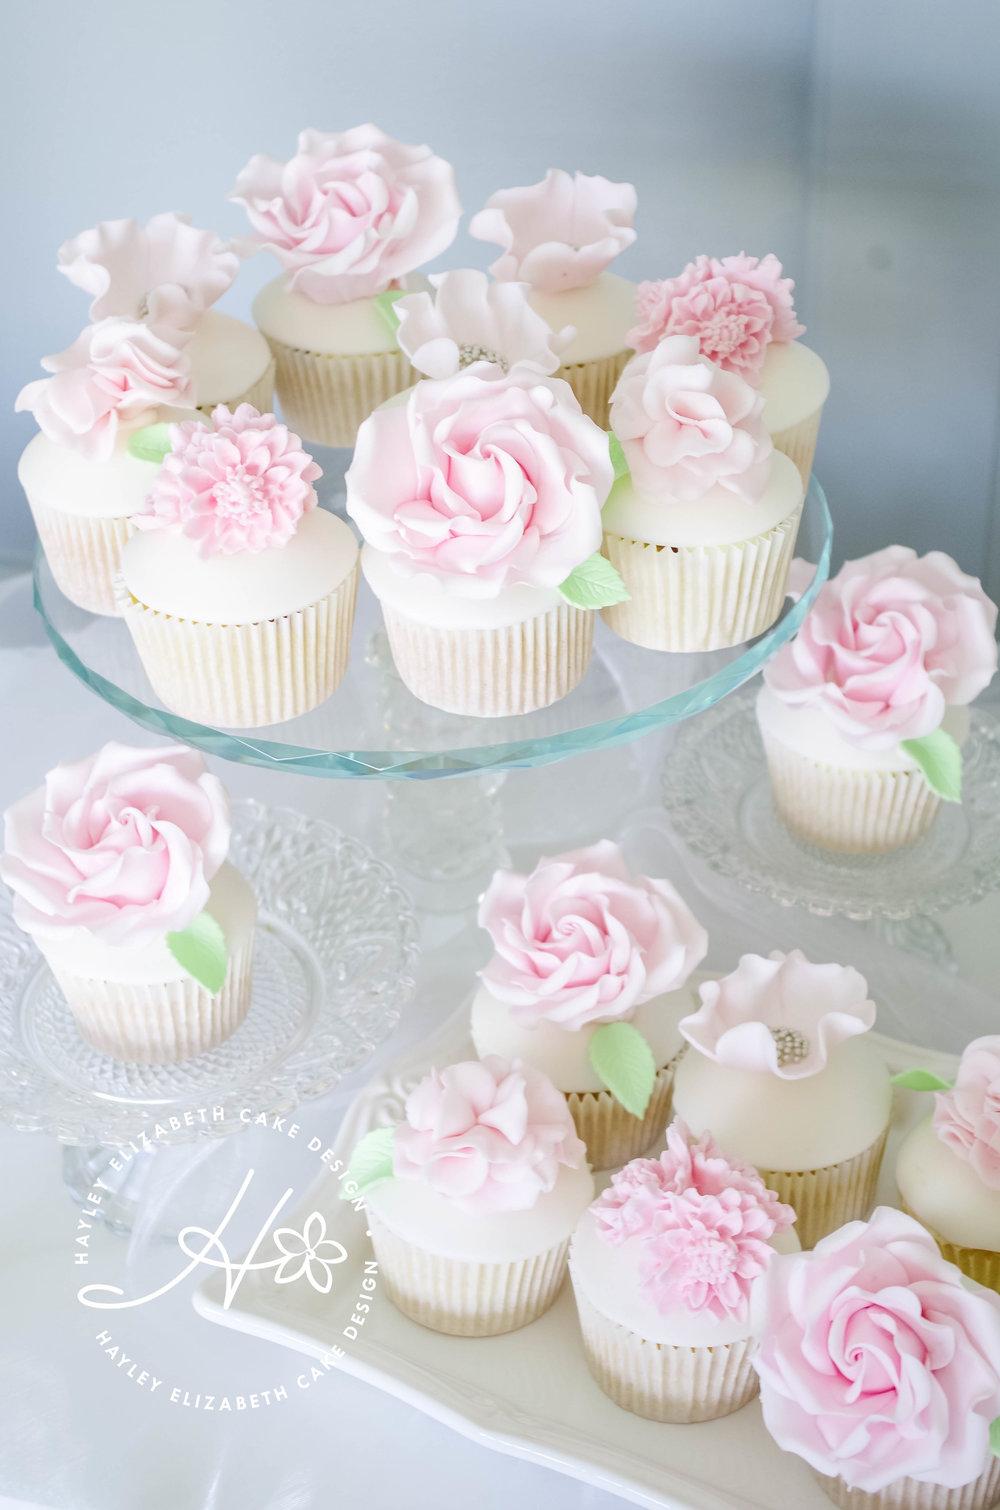 pink-flower-cupcakes-closeup.jpg